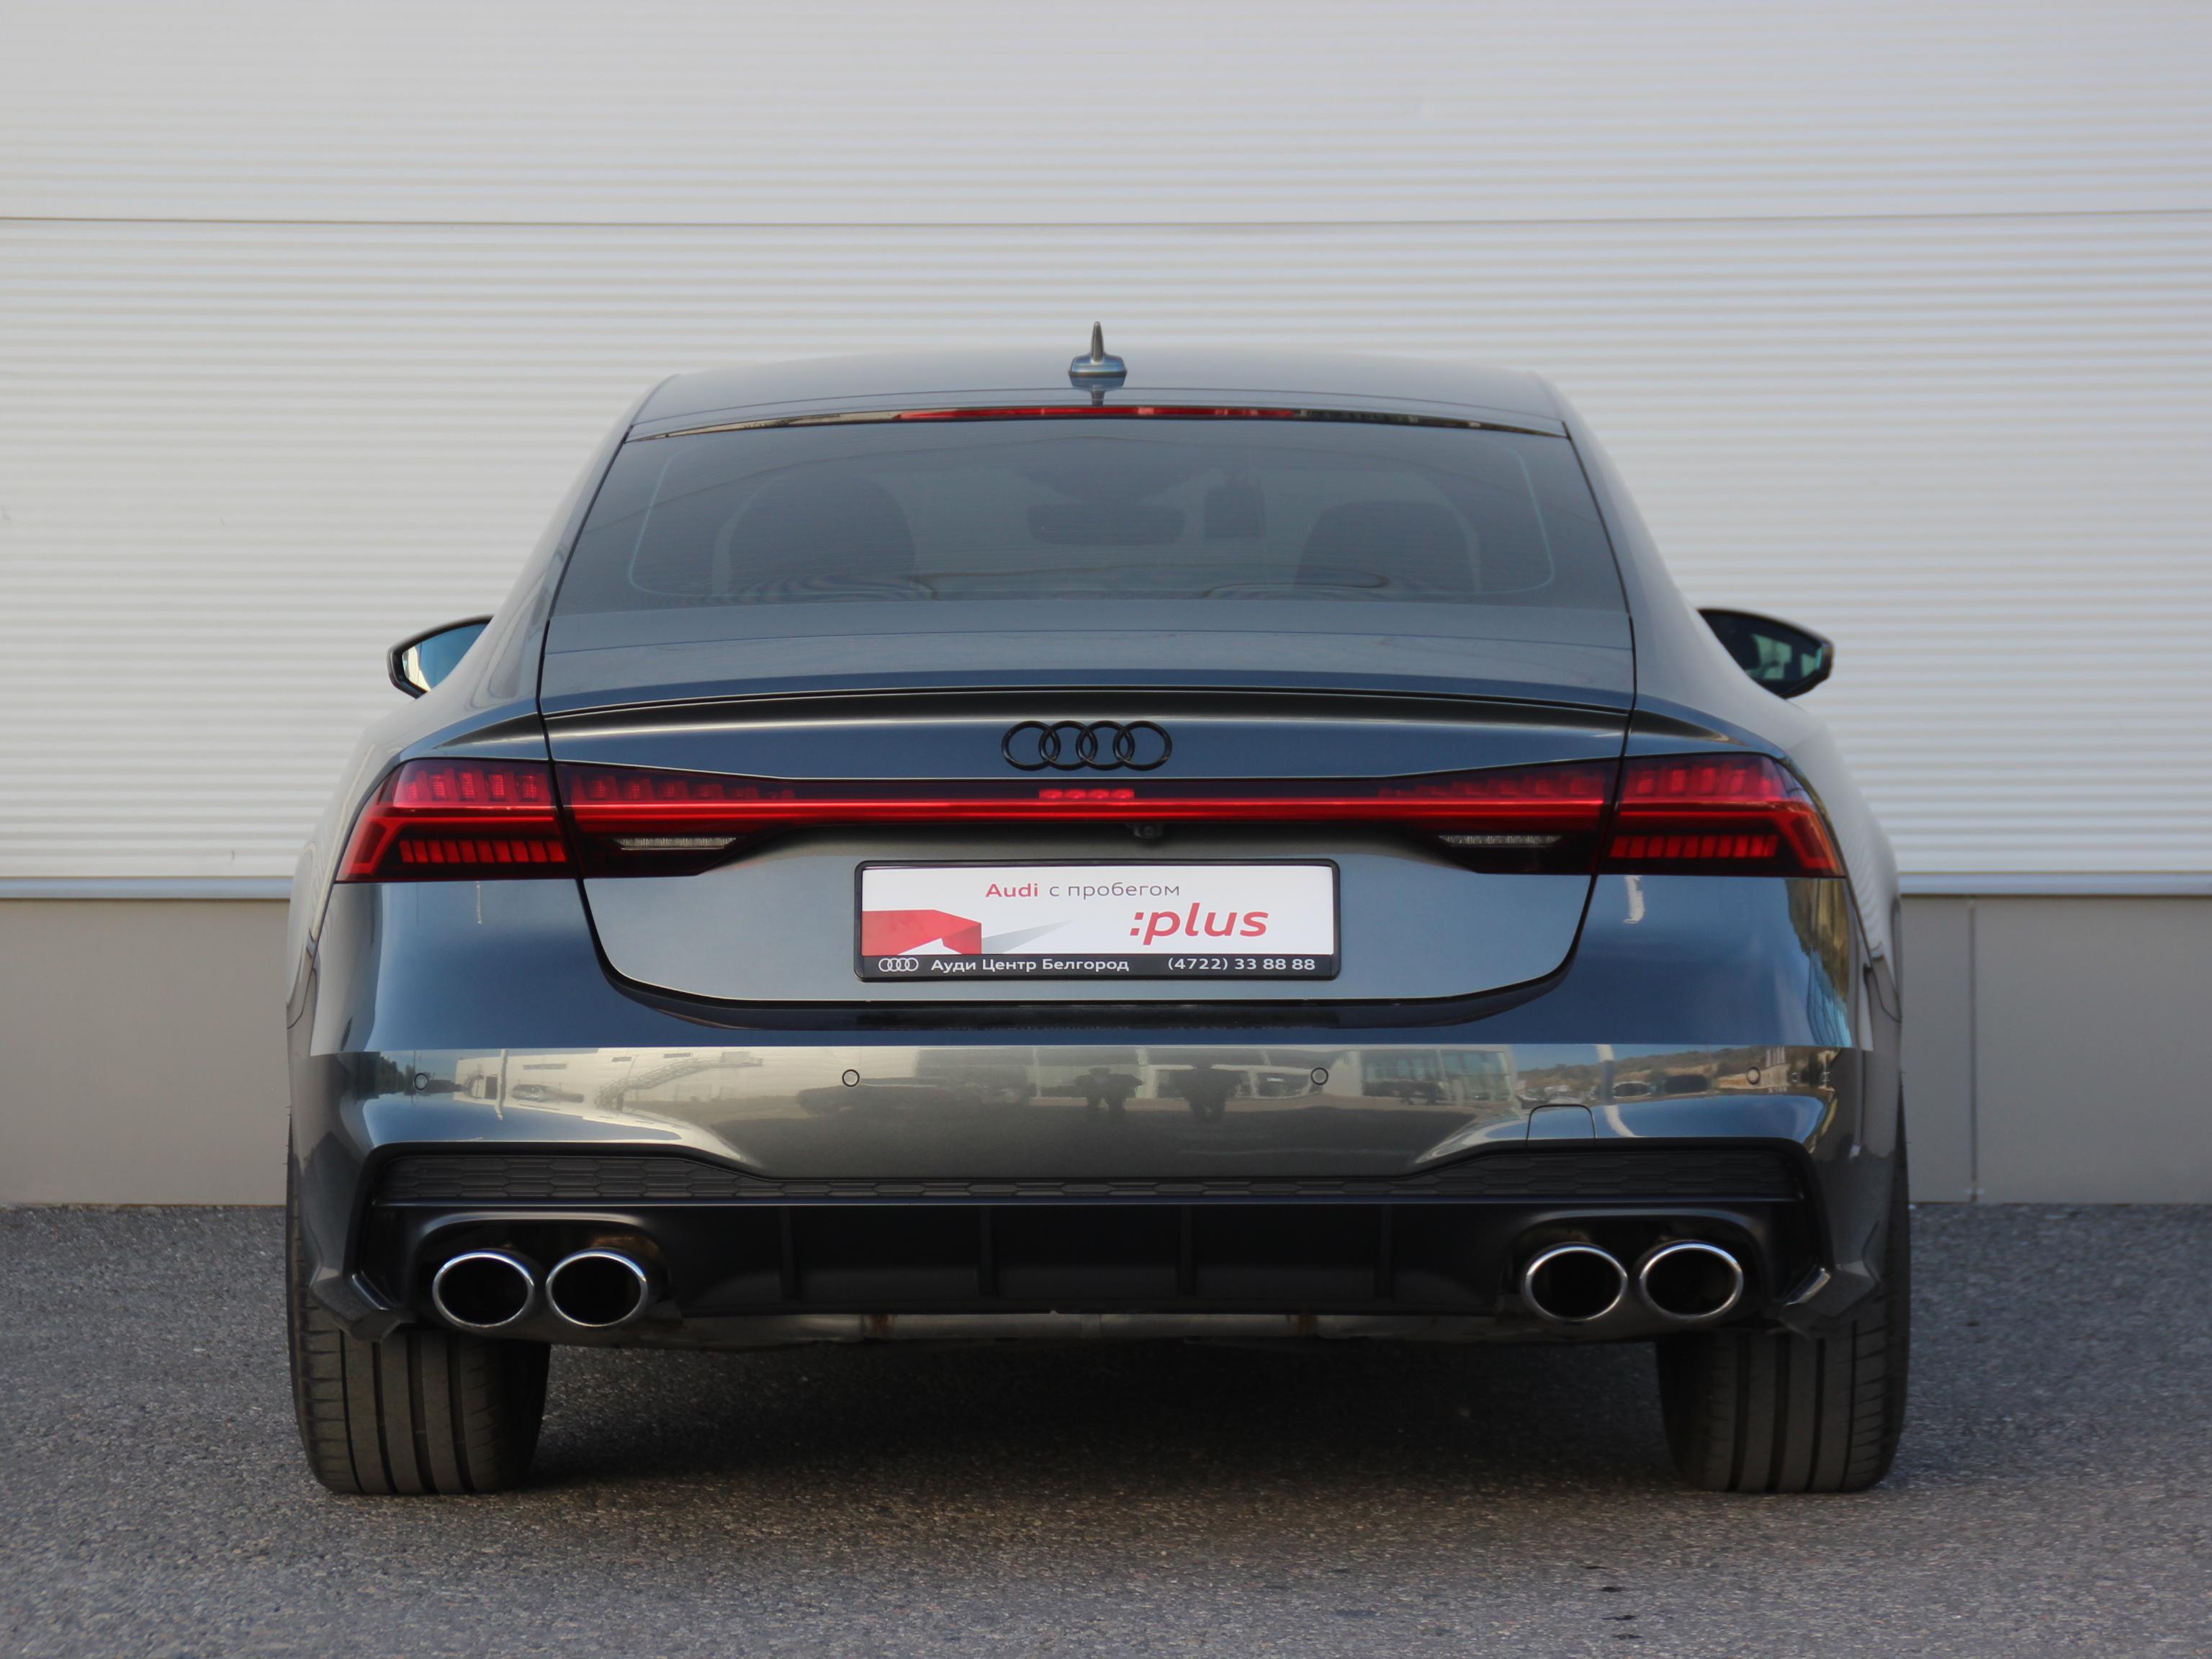 Audi A7 Хэтчбек (2018г.)